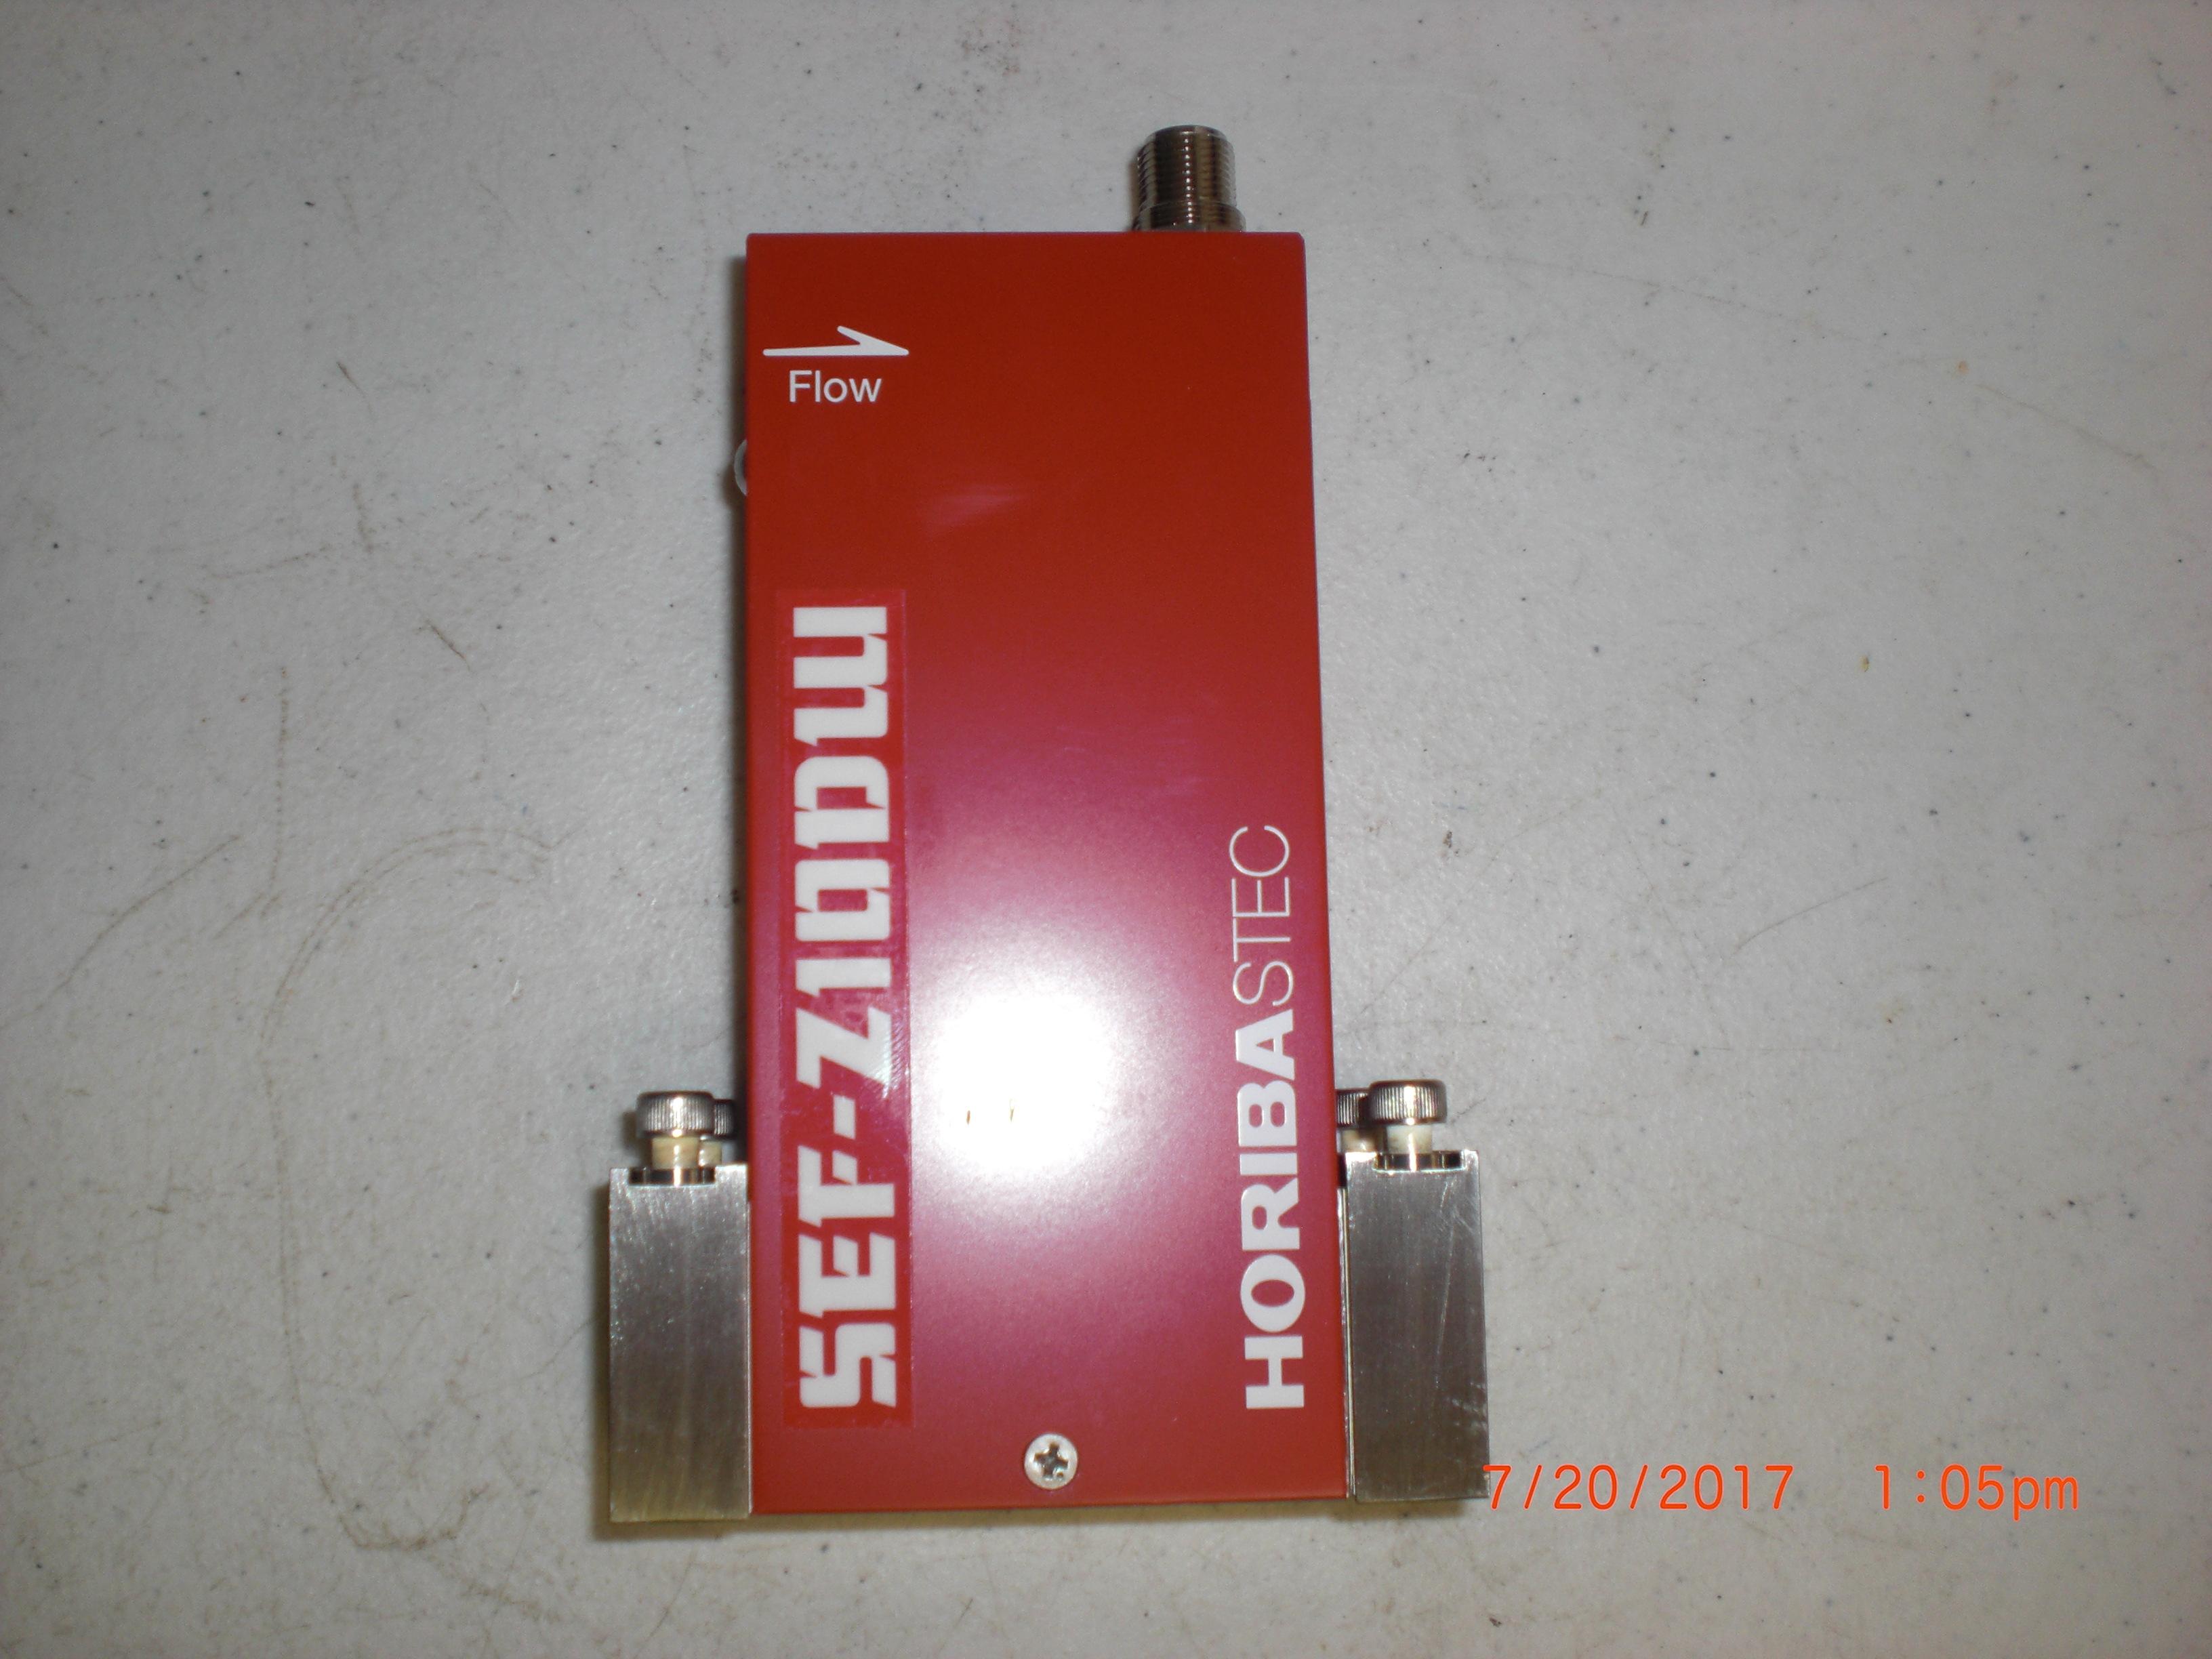 MFC HOREBIA / STEC SEC-Z12DWM-HCL-1SLM Harvested never installed System